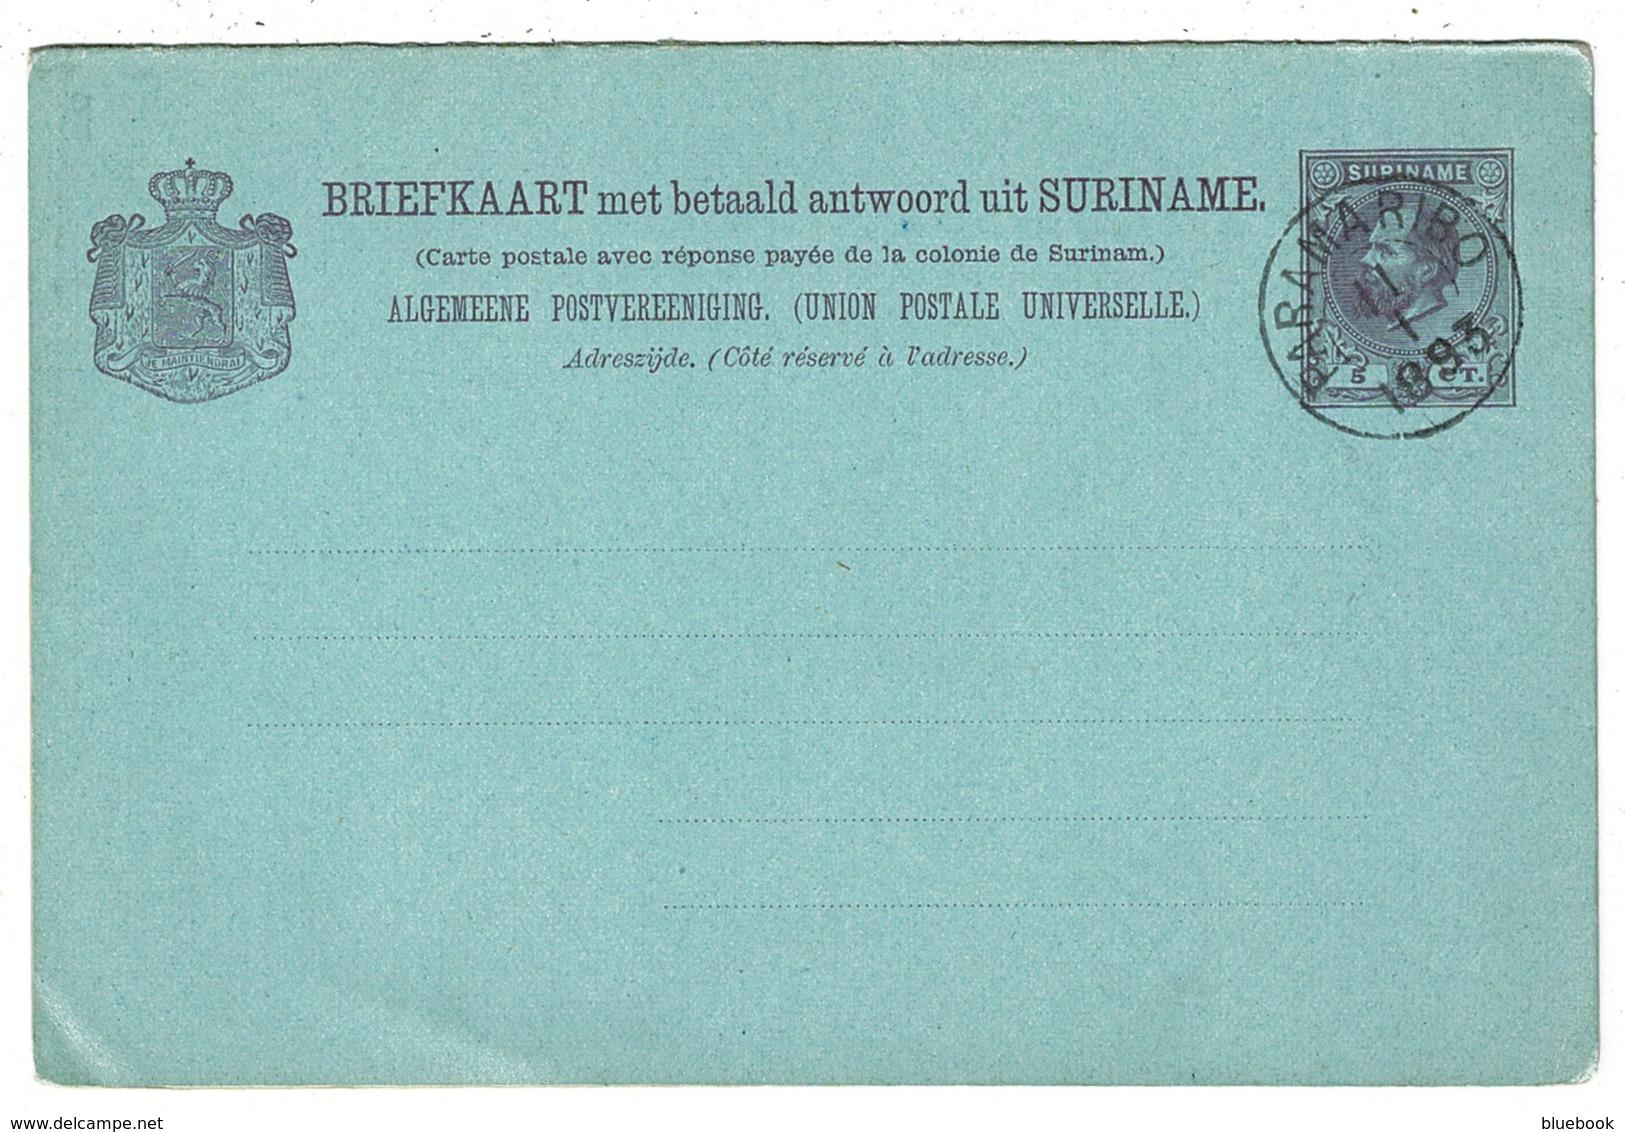 Ref 1311 - 1893 Suriname Surinam Reply Paid Postal Stationery Card H&G 8 - Netherlands Interest - Surinam